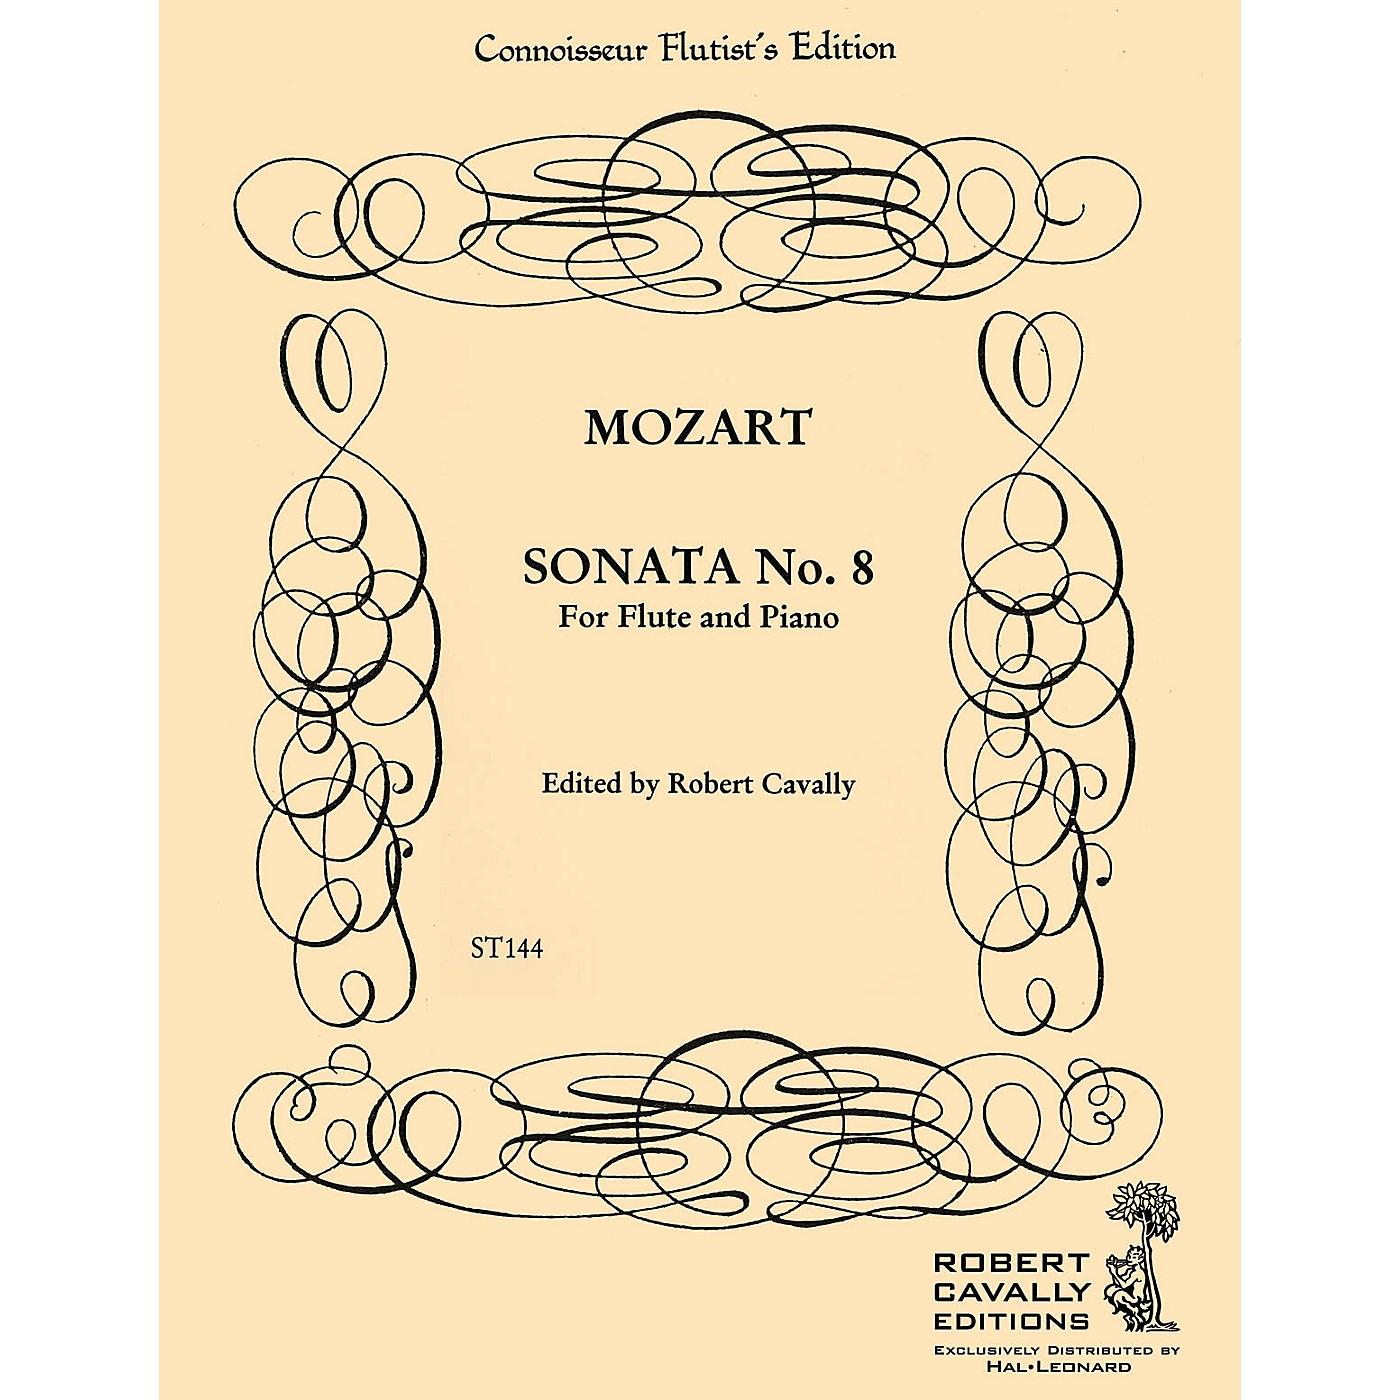 Cavally Editions Sonata No. 8 in F (Connoisseur Flutist's Edition) Robert Cavally Editions Series by Robert Cavally thumbnail